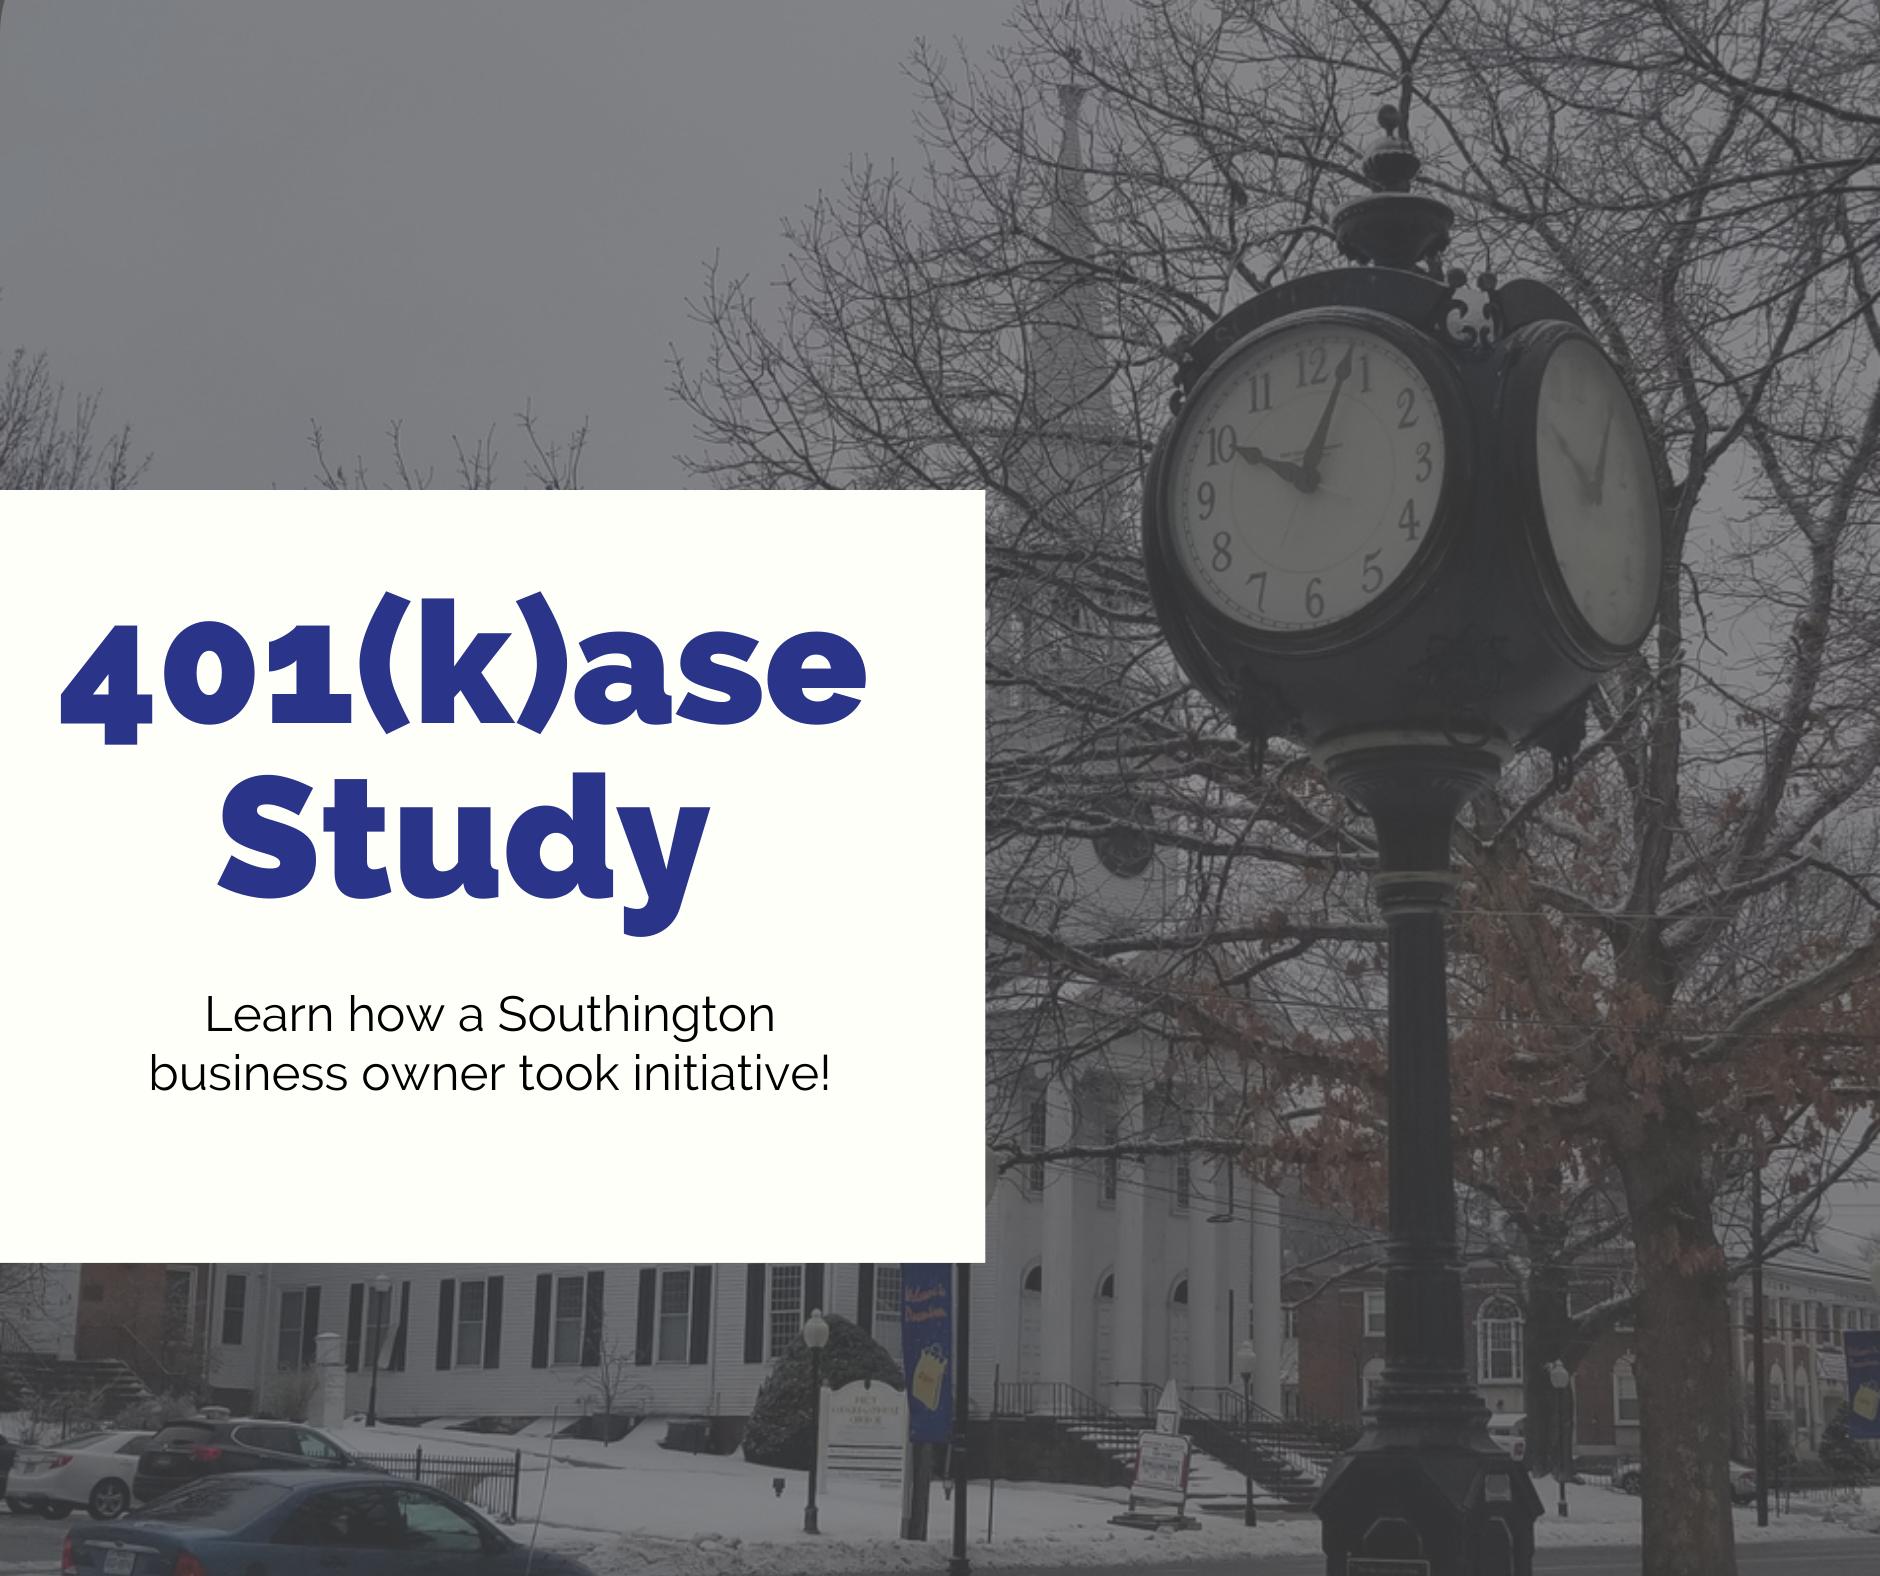 401(k)ase Study Thumbnail